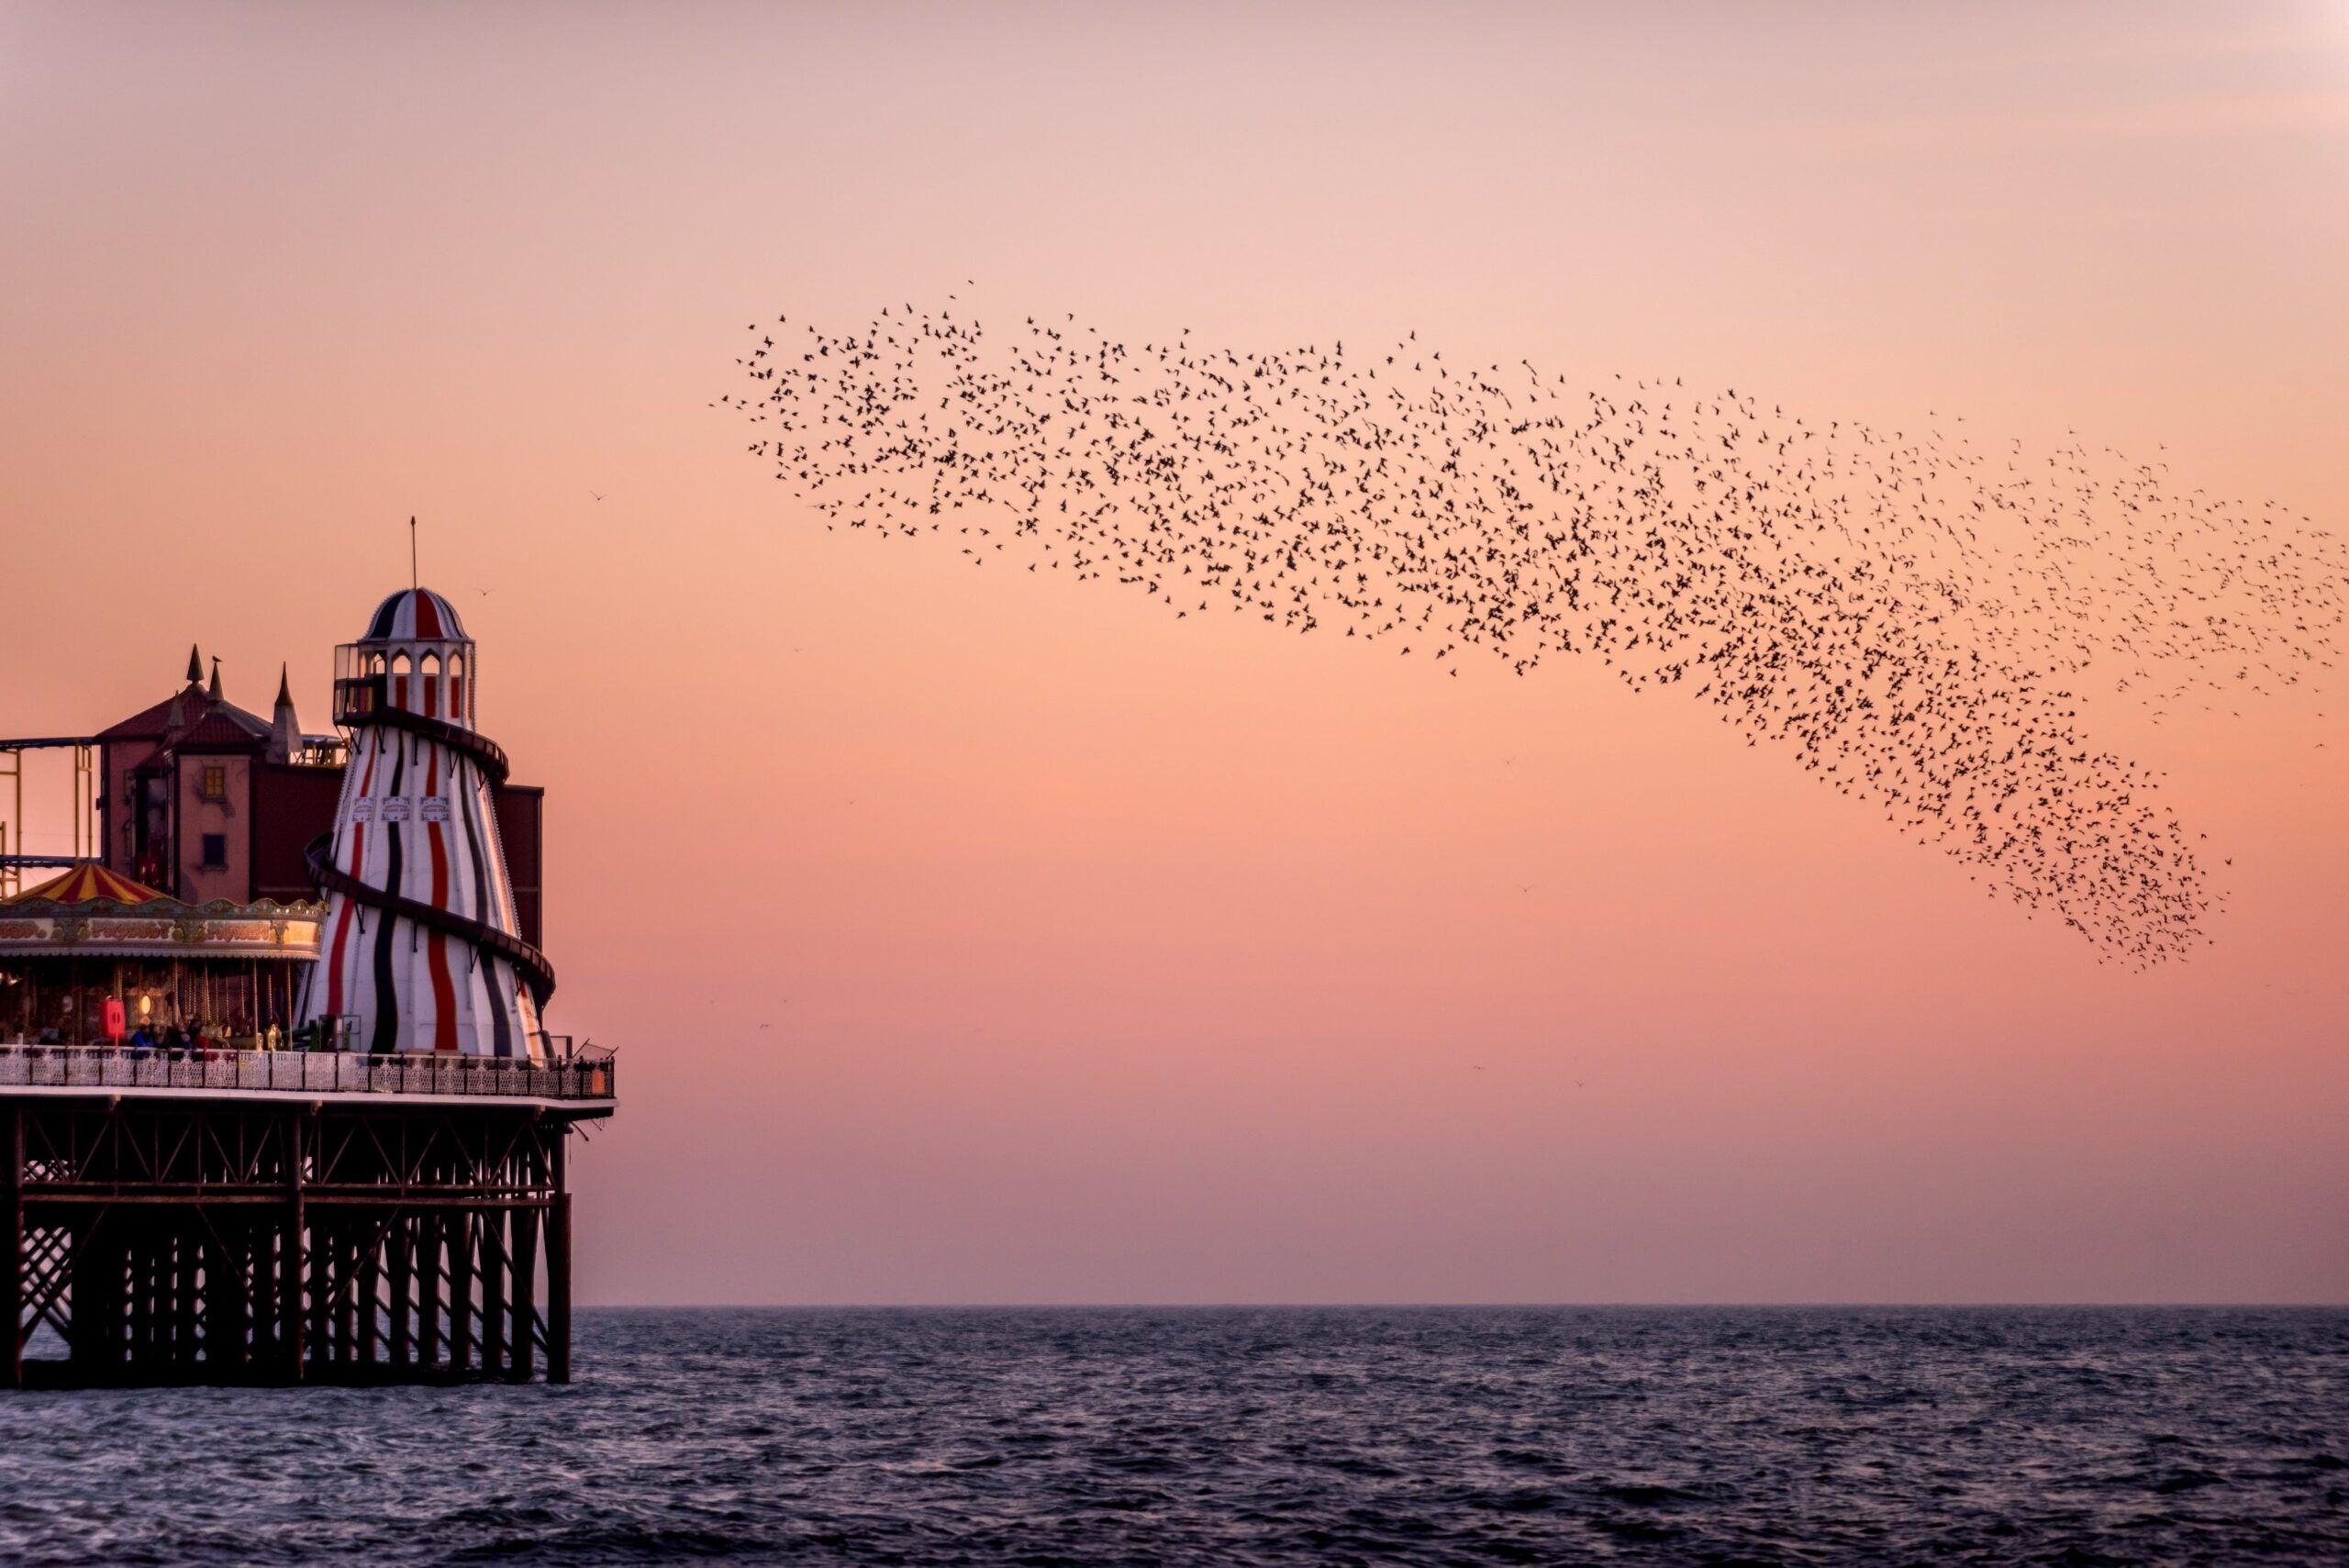 Howard Jacobson's Diary: Soho never sleeps – so I escape to see the rides at Brighton Pier